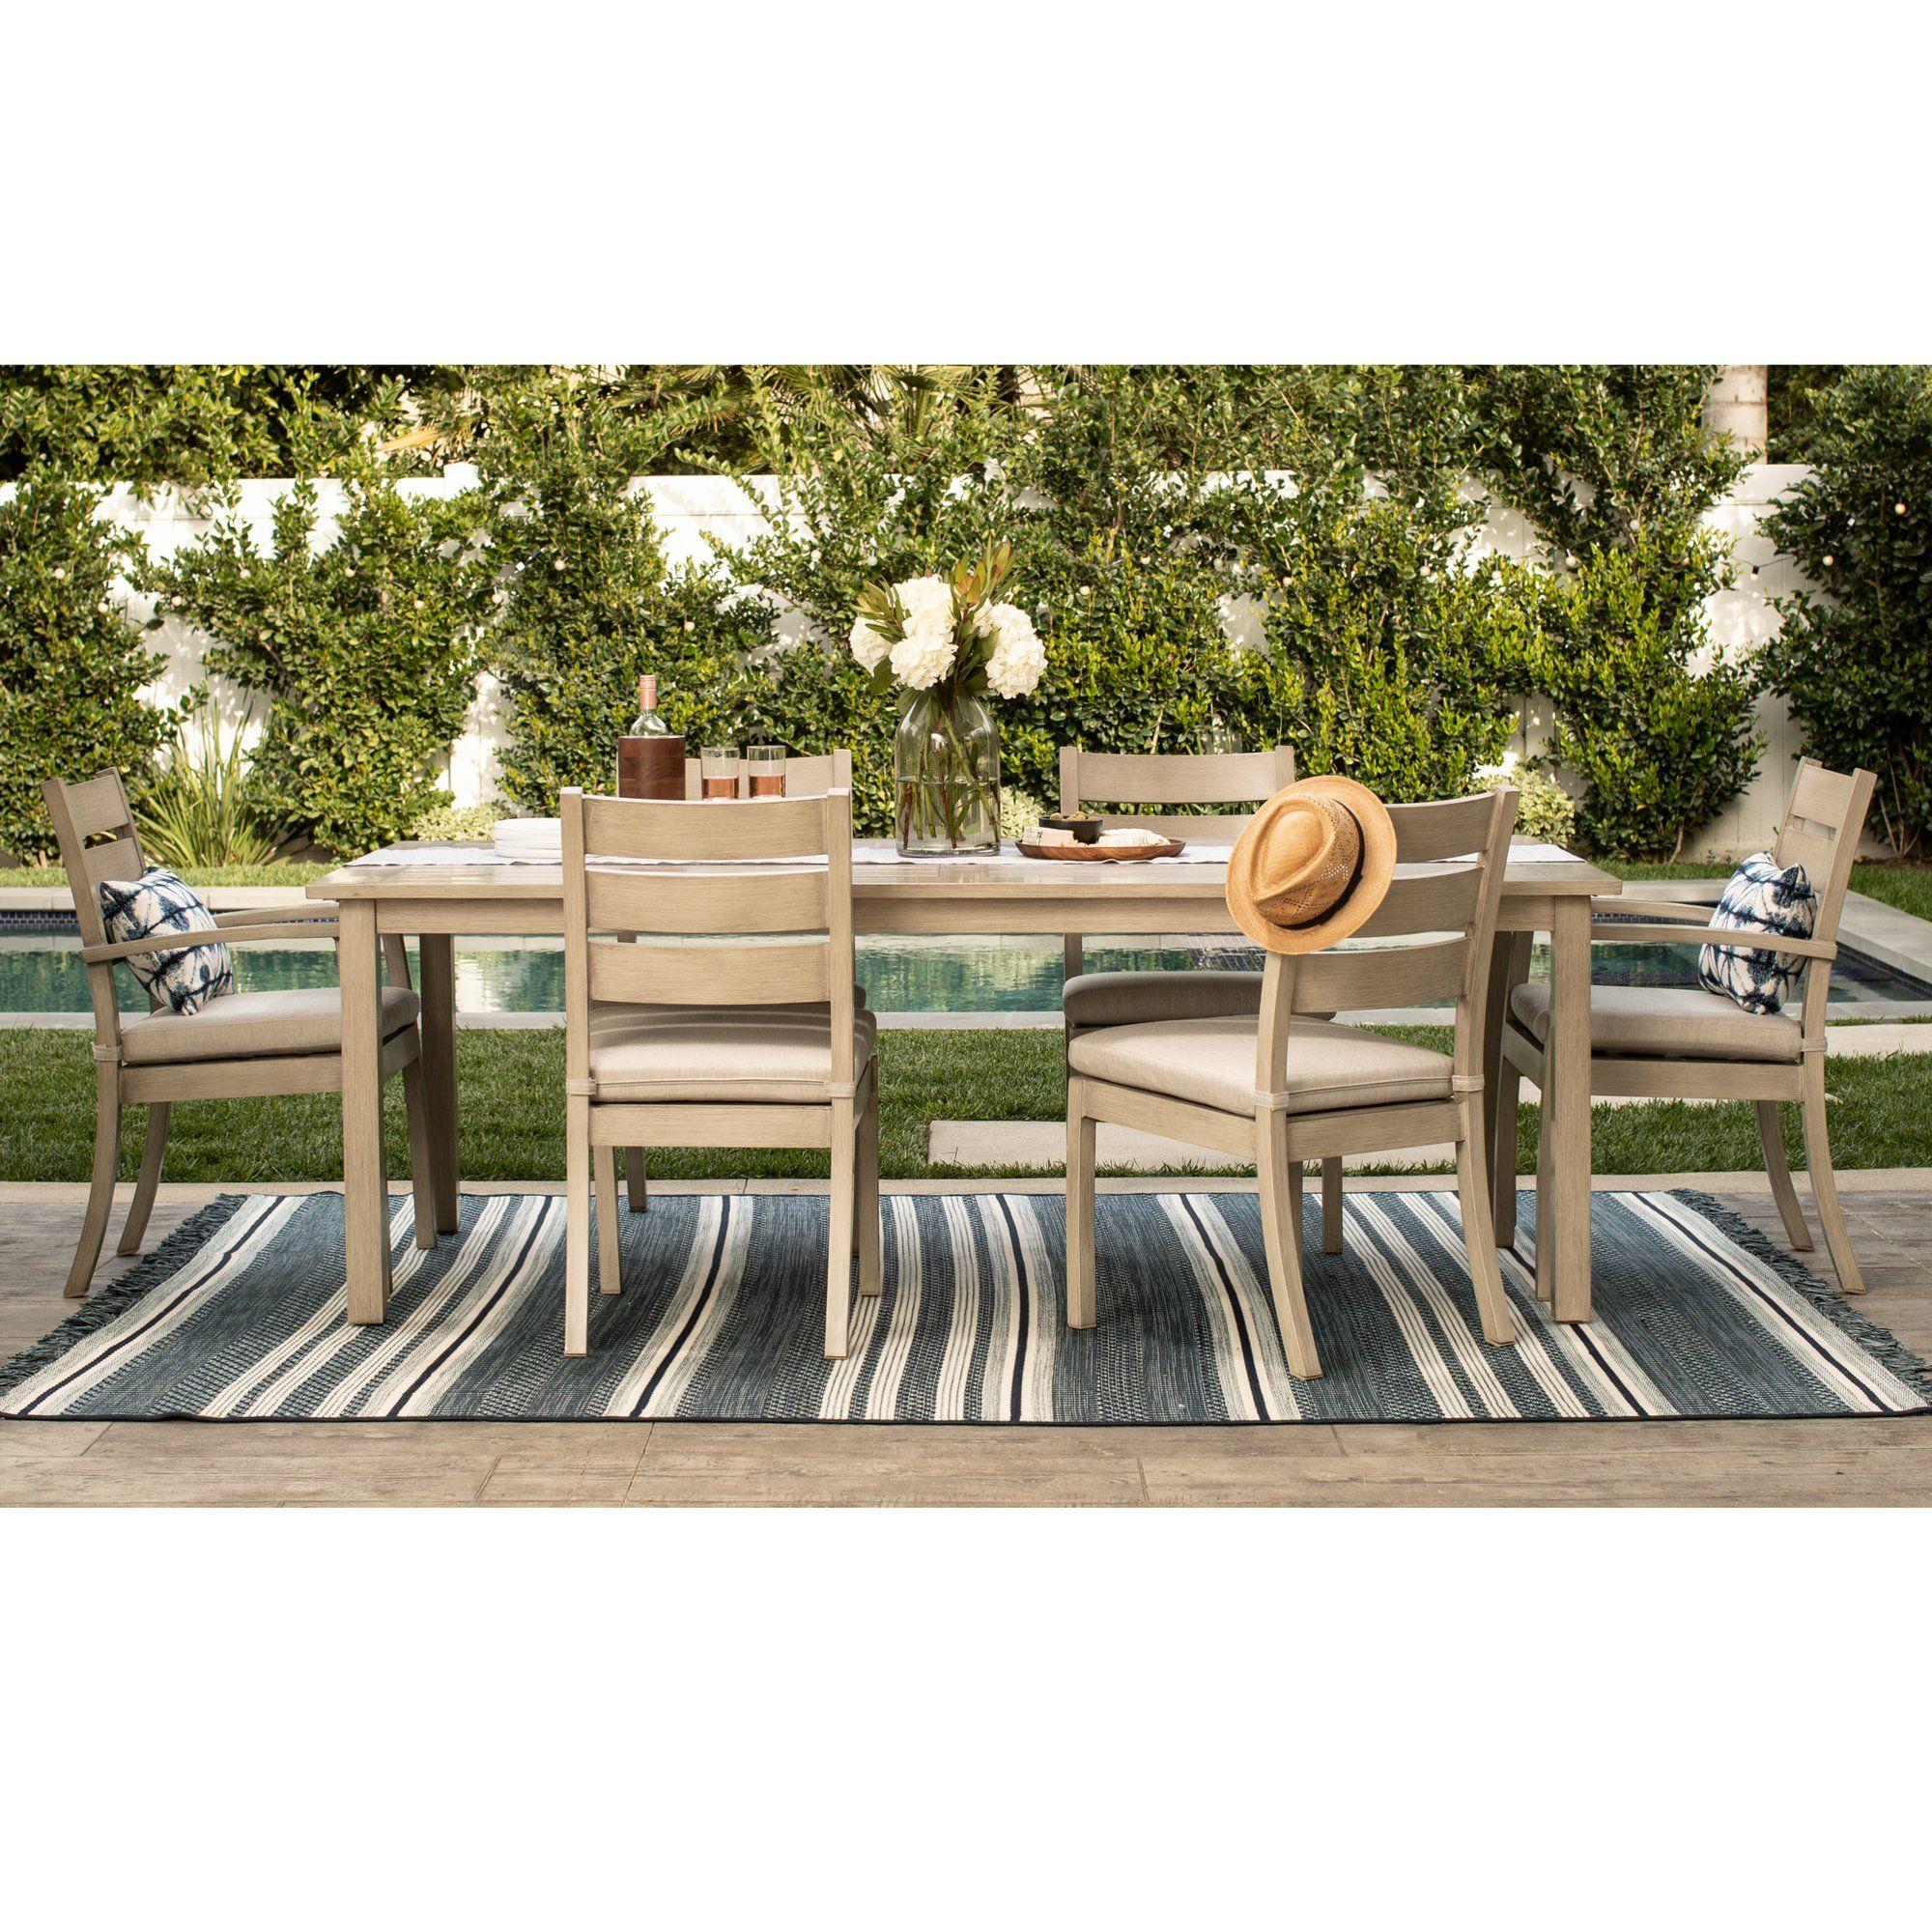 Eden 7 Piece Rectangular Outdoor Dining Set Outdoor Dining Set Furniture Sets Design Dining Furniture Sets